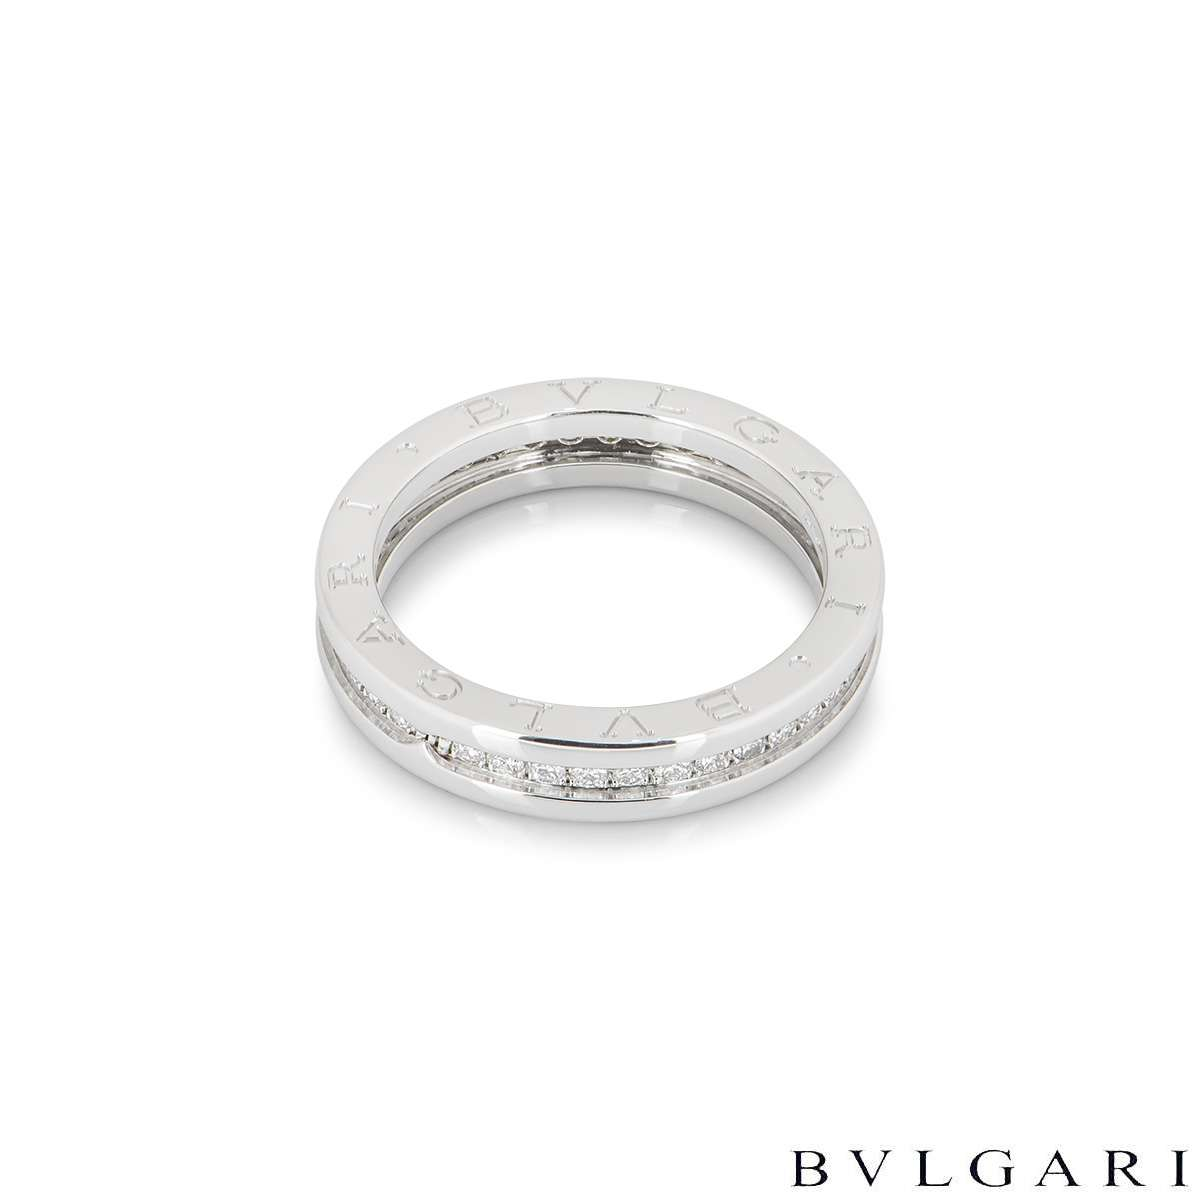 Bvlgari White Gold Diamond Set B.zero1 Ring 329341